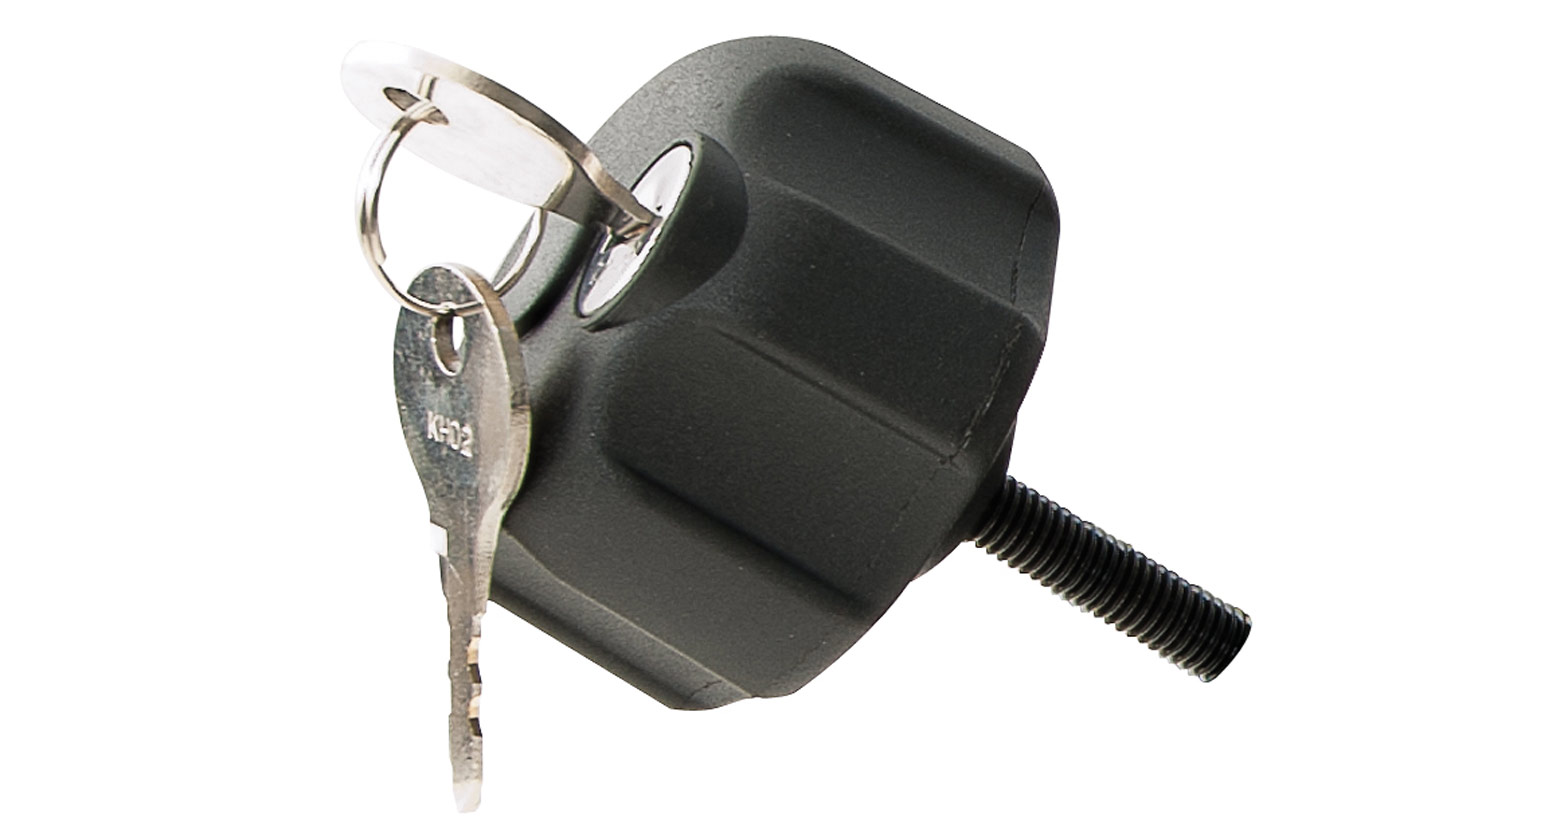 rhino rack rshl shovel holder lock suit rhino rack vortex hd thule whispbar rola ebay. Black Bedroom Furniture Sets. Home Design Ideas